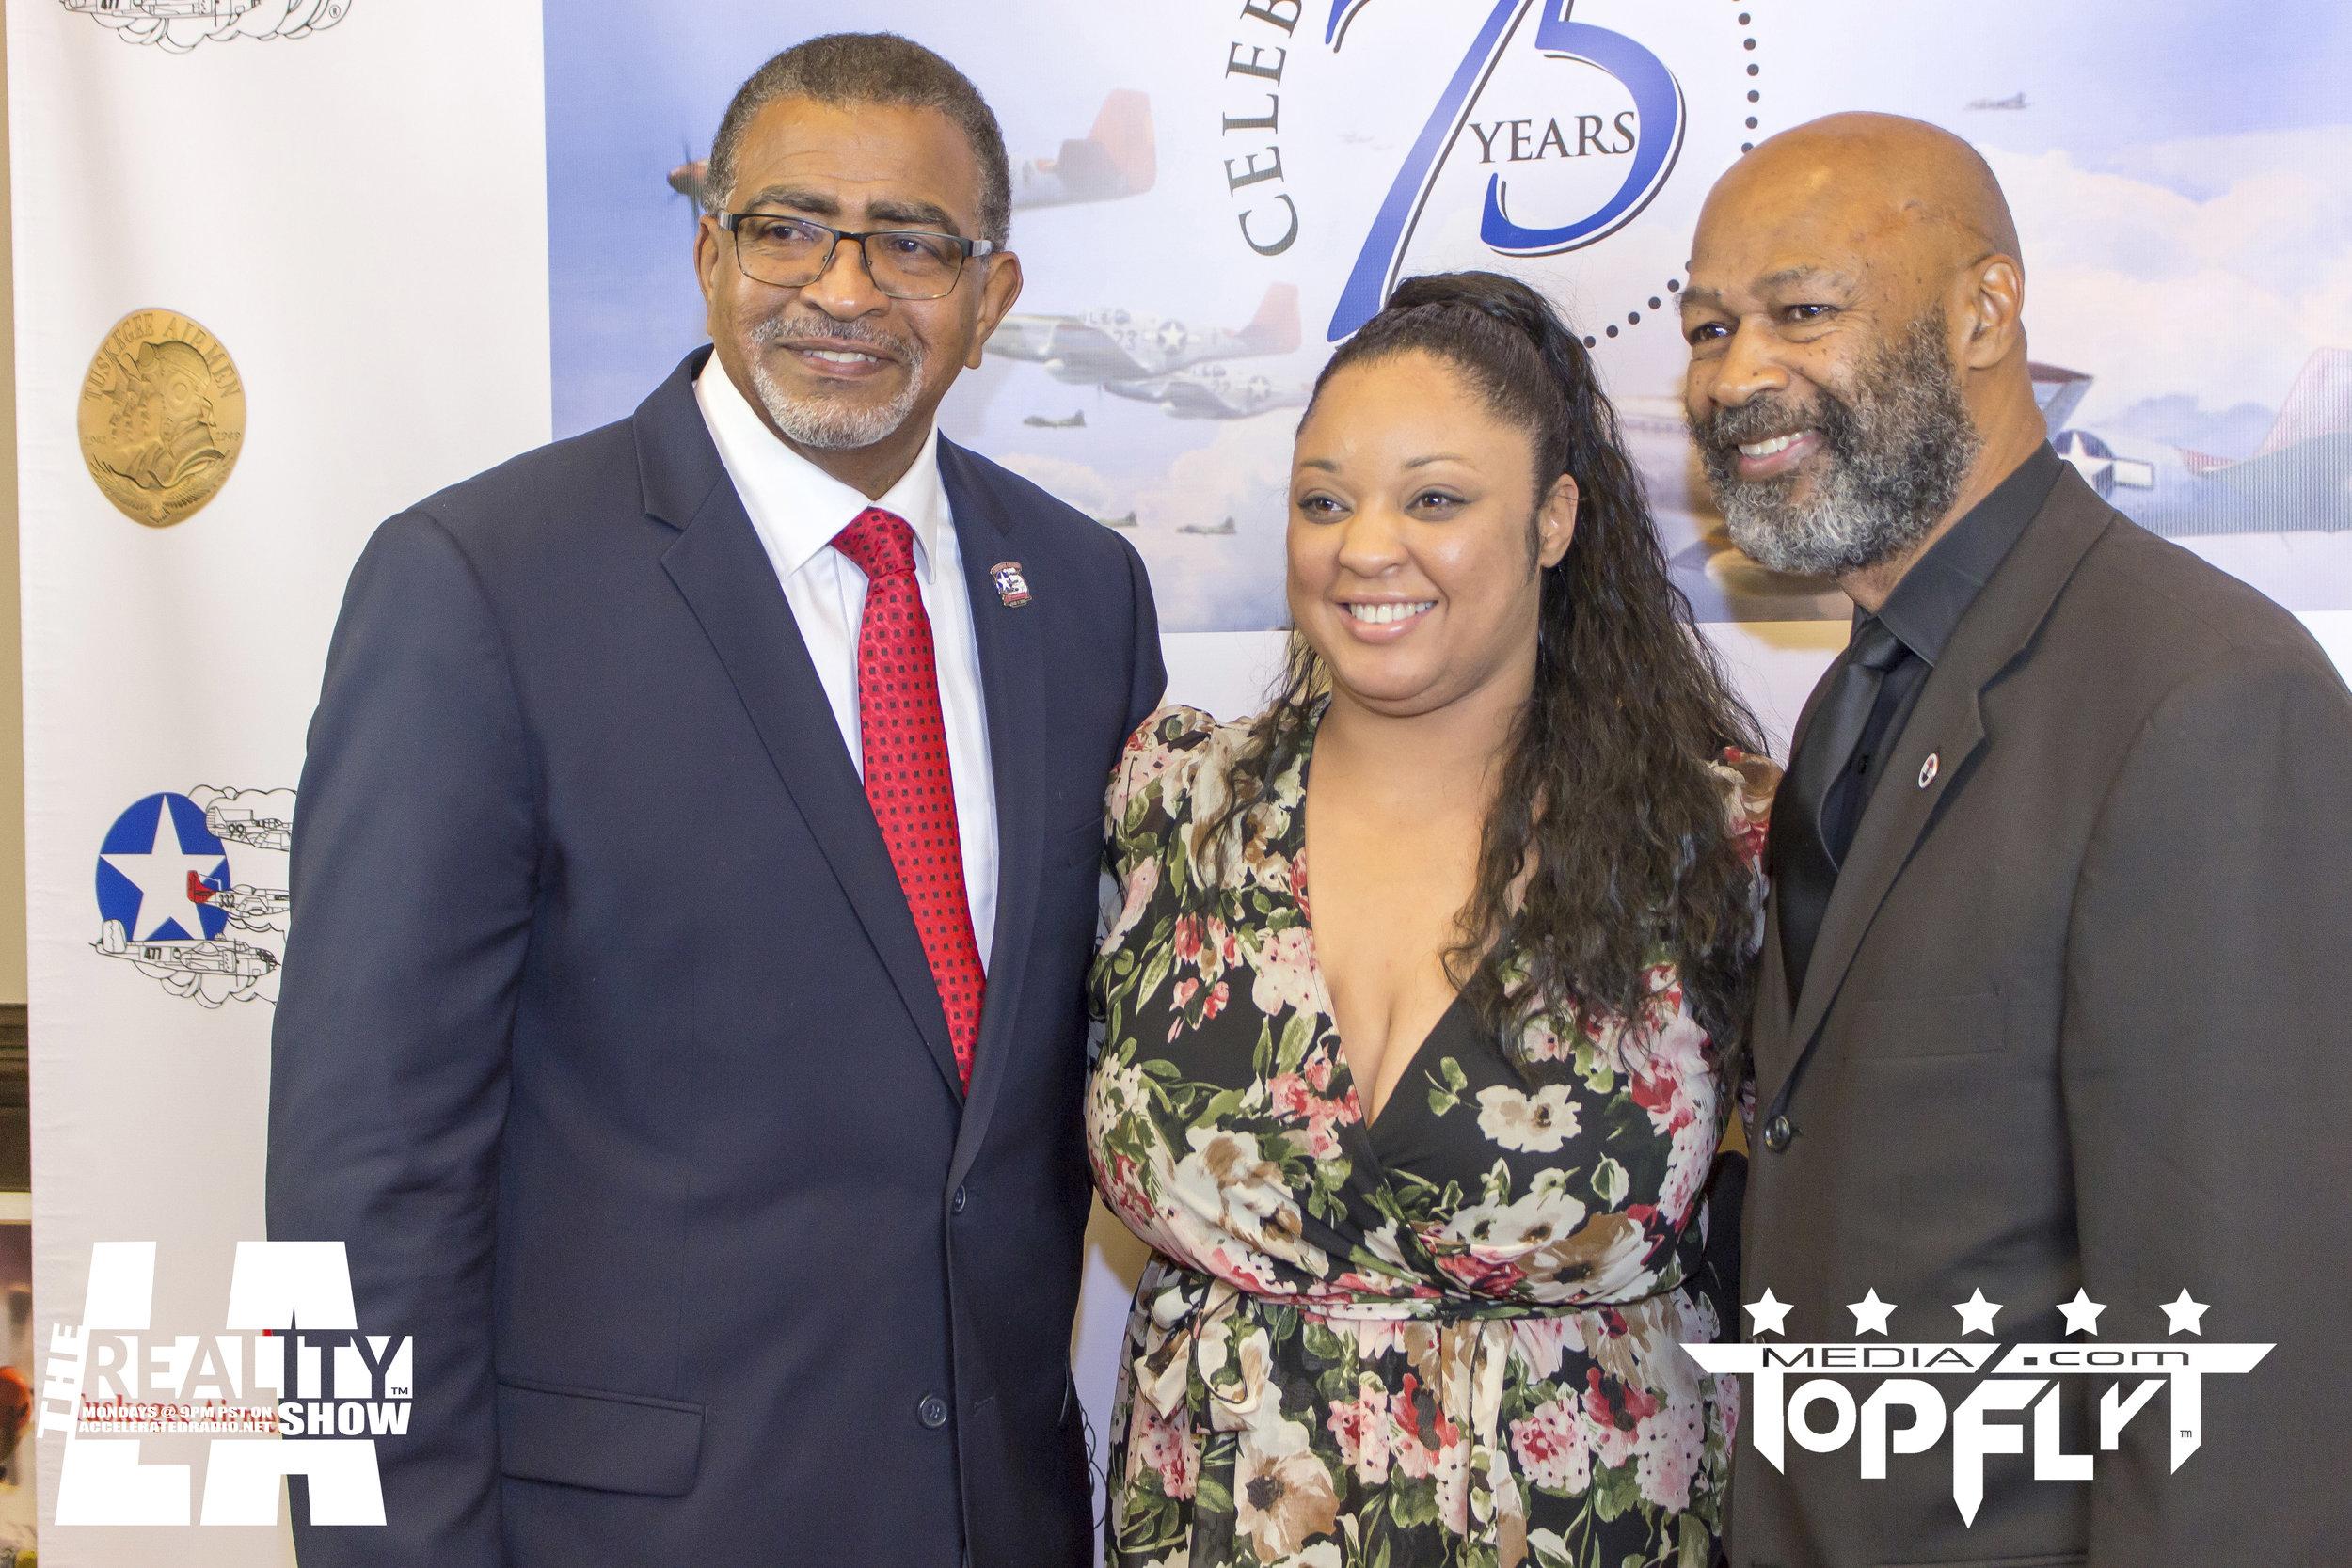 The Reality Show LA - Tuskegee Airmen 75th Anniversary VIP Reception_118.jpg